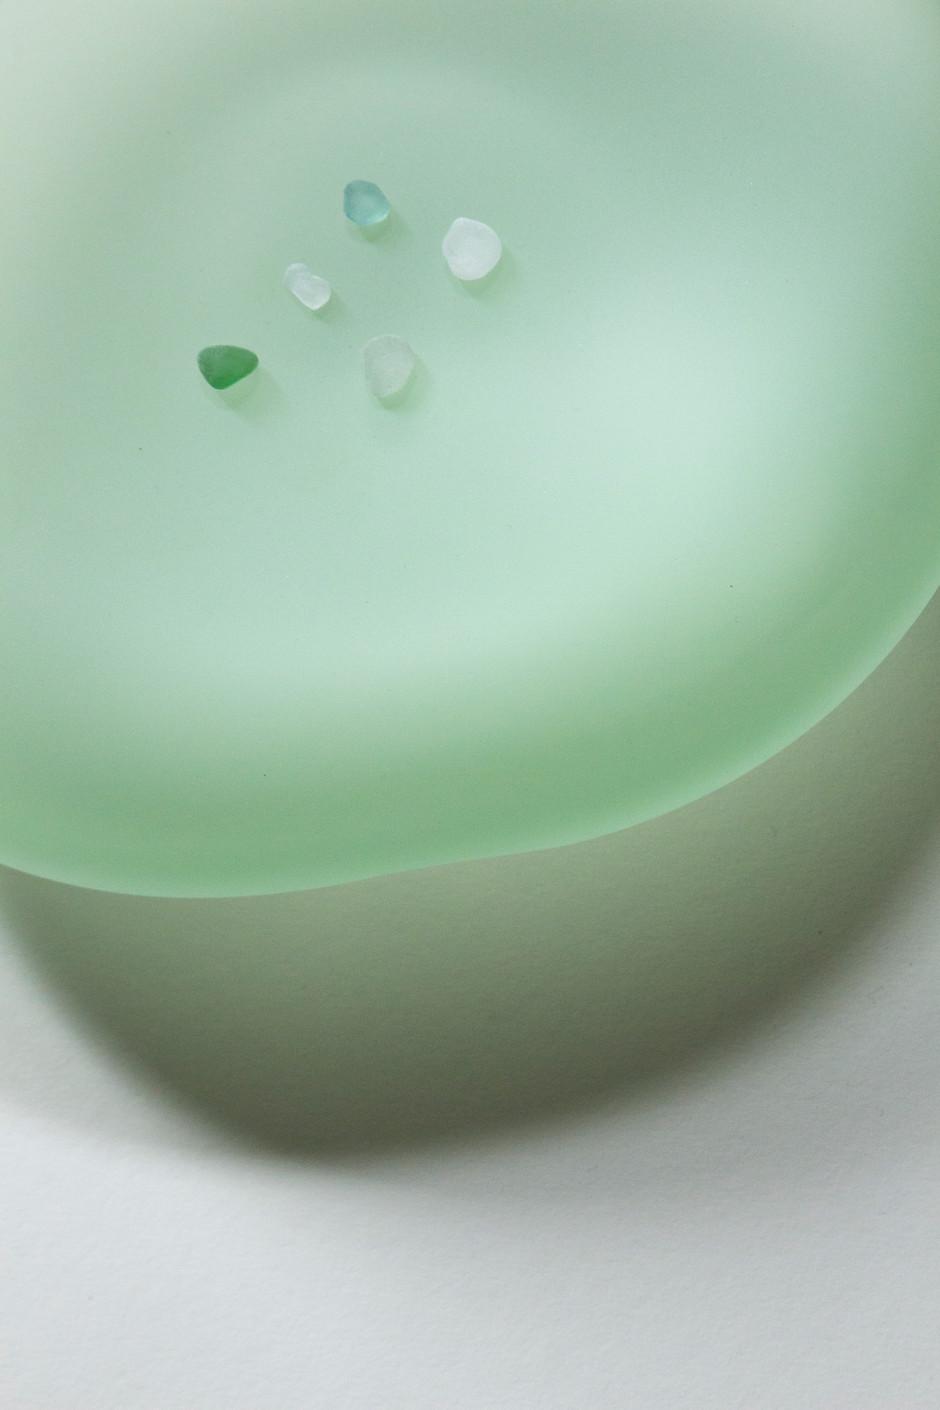 SEA GLASS SERIES by MILENA KLING